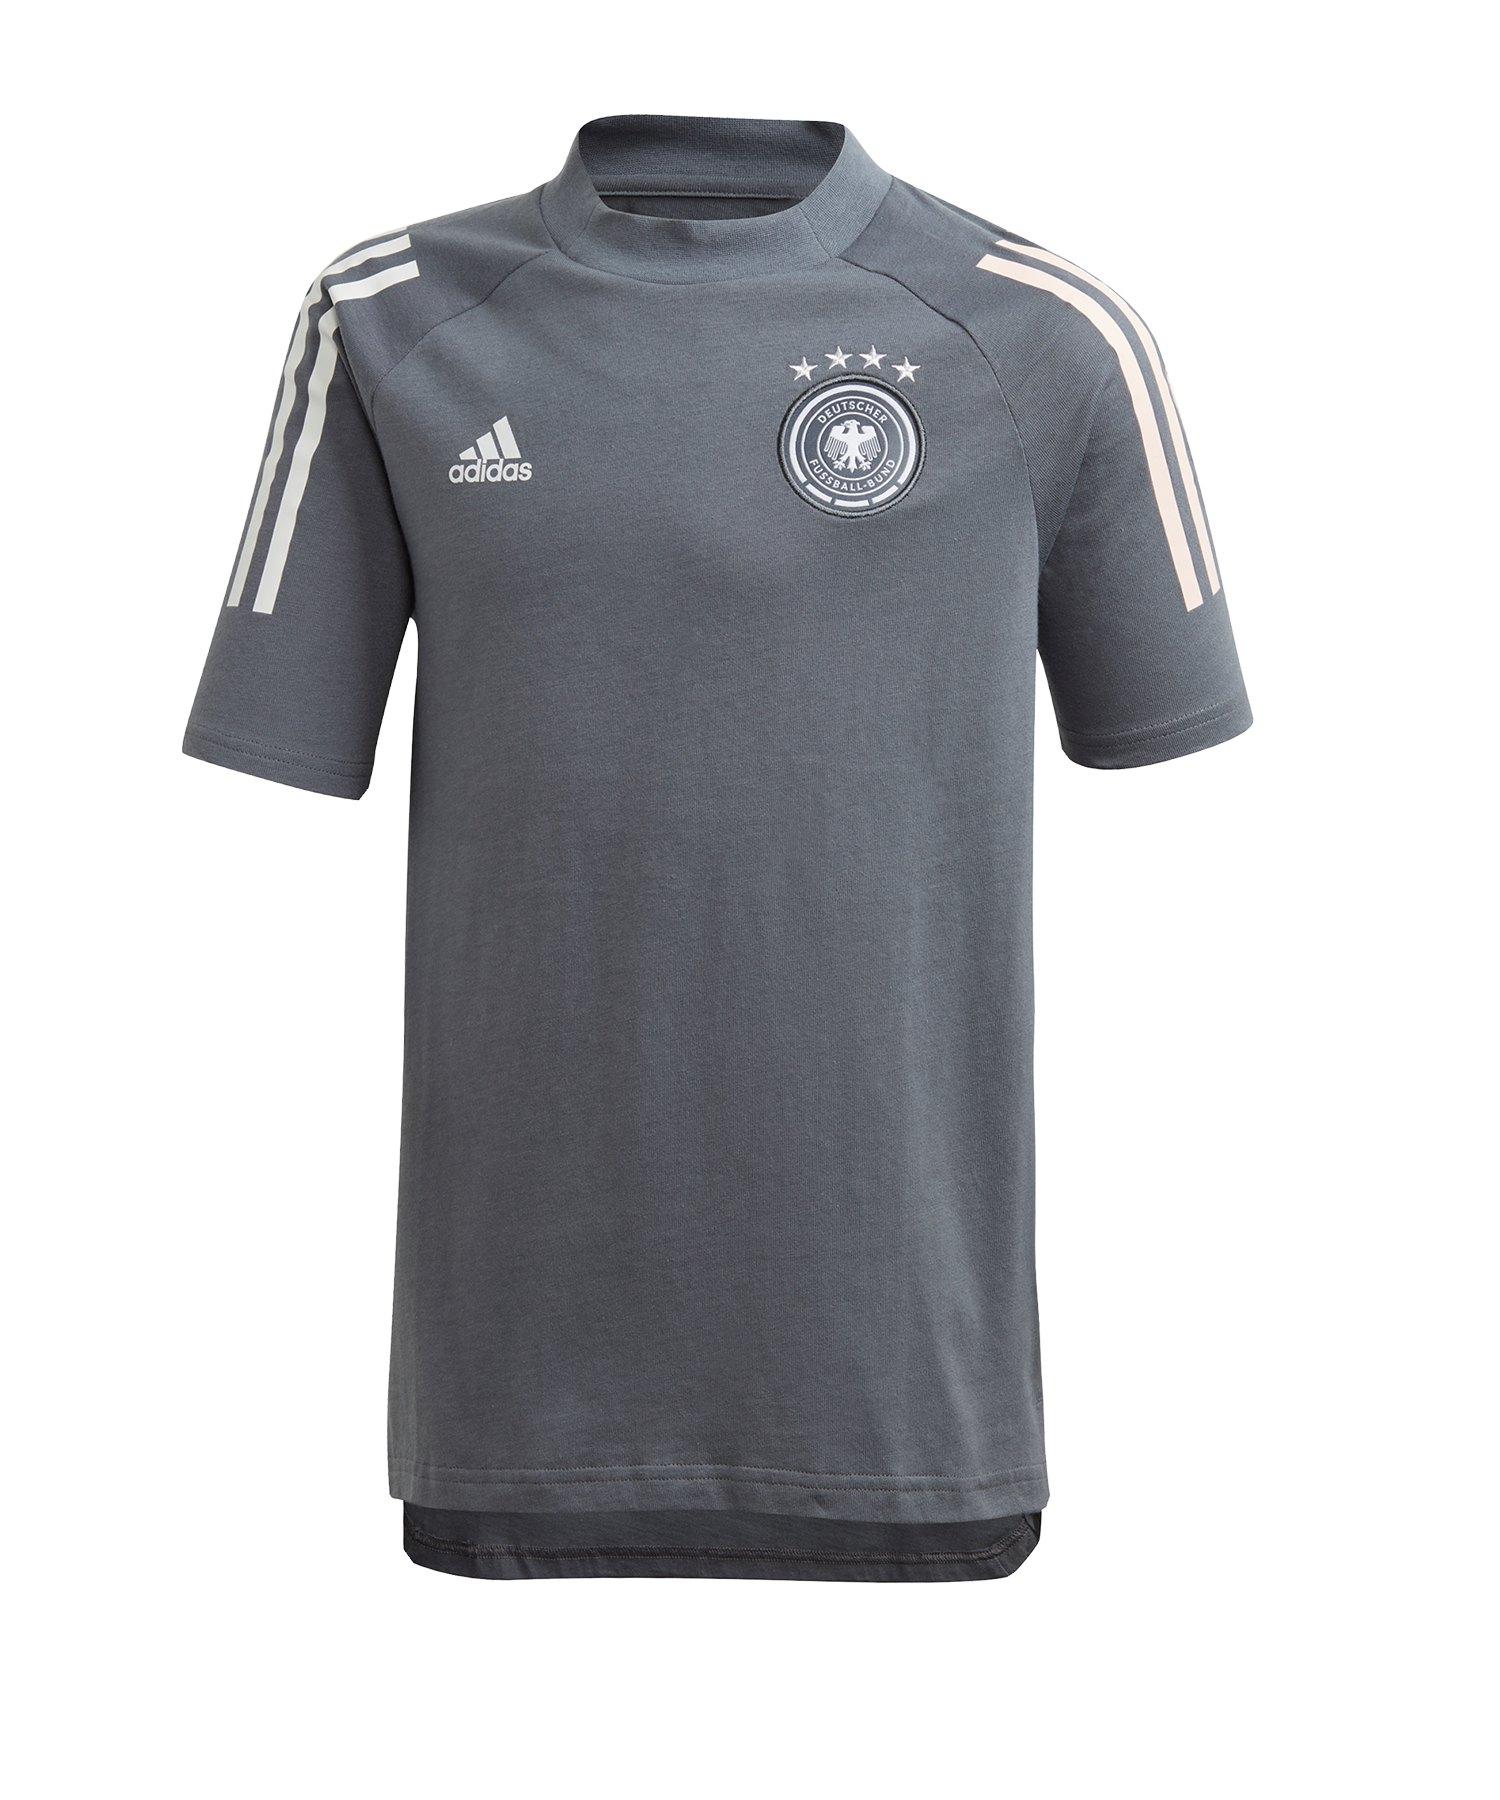 adidas DFB Deutschland Tee T-Shirt Kids Grau - grau